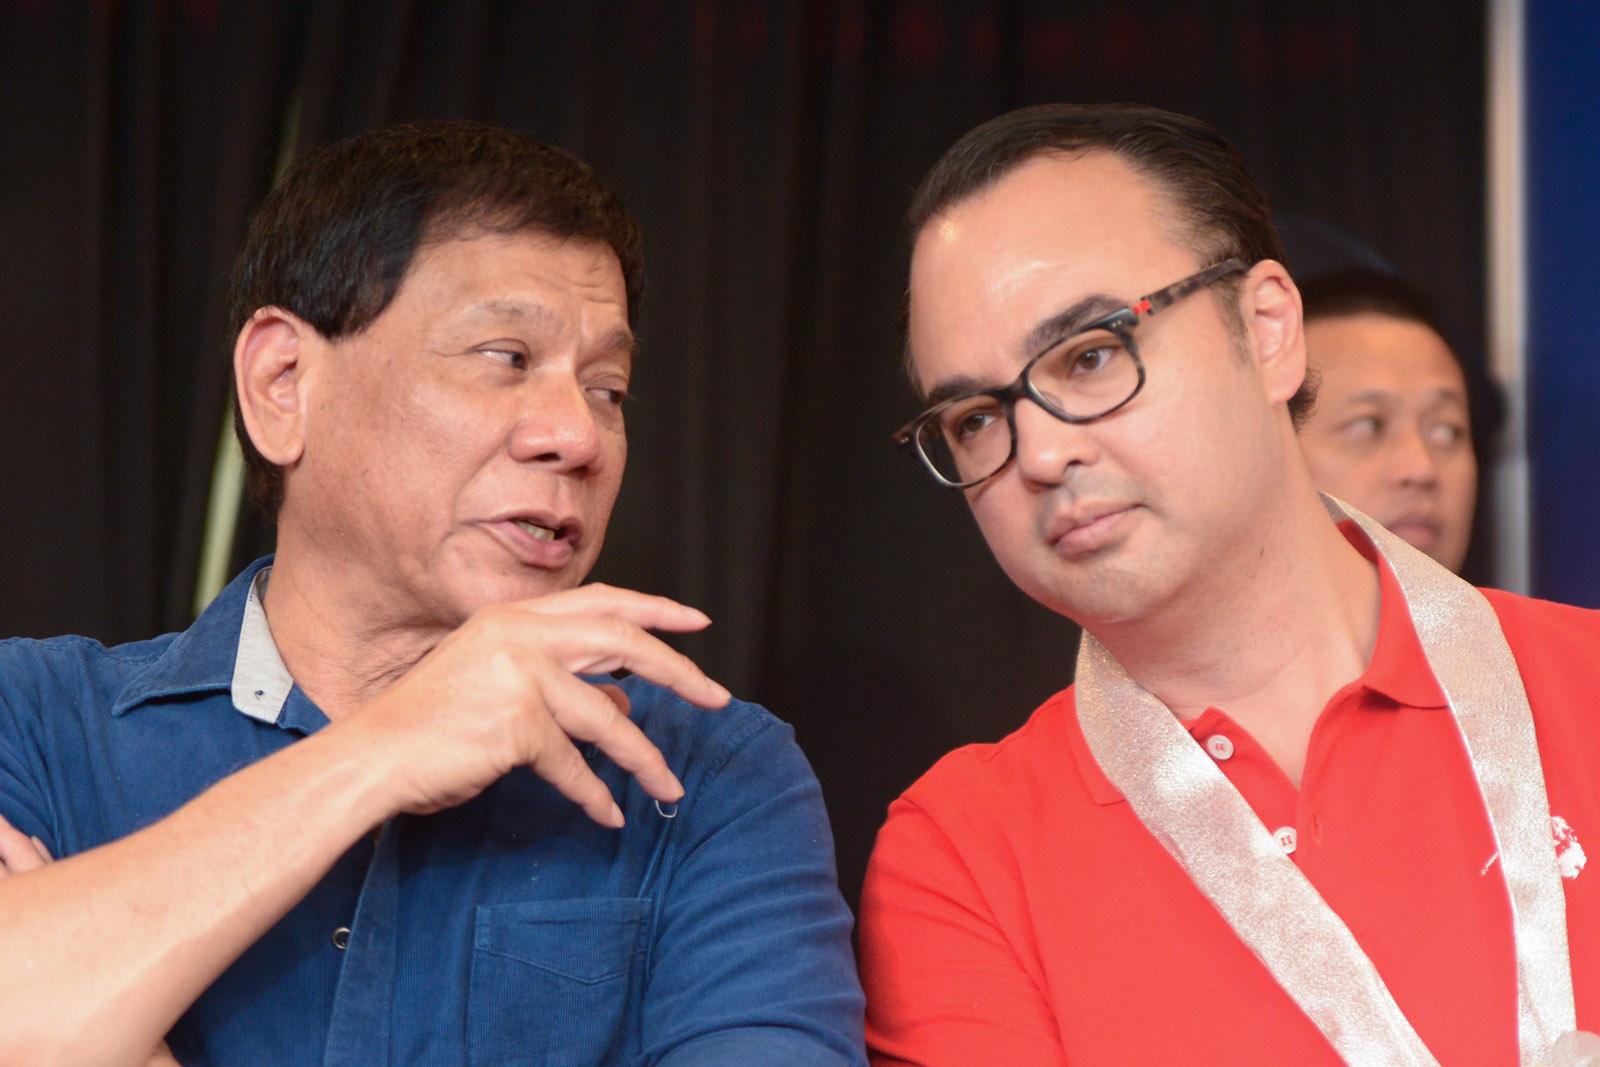 TANDEM. Rodrigo Duterte and Alan Peter Cayetano team up for the 2016 elections. File photo by Jansen Romero/Rappler